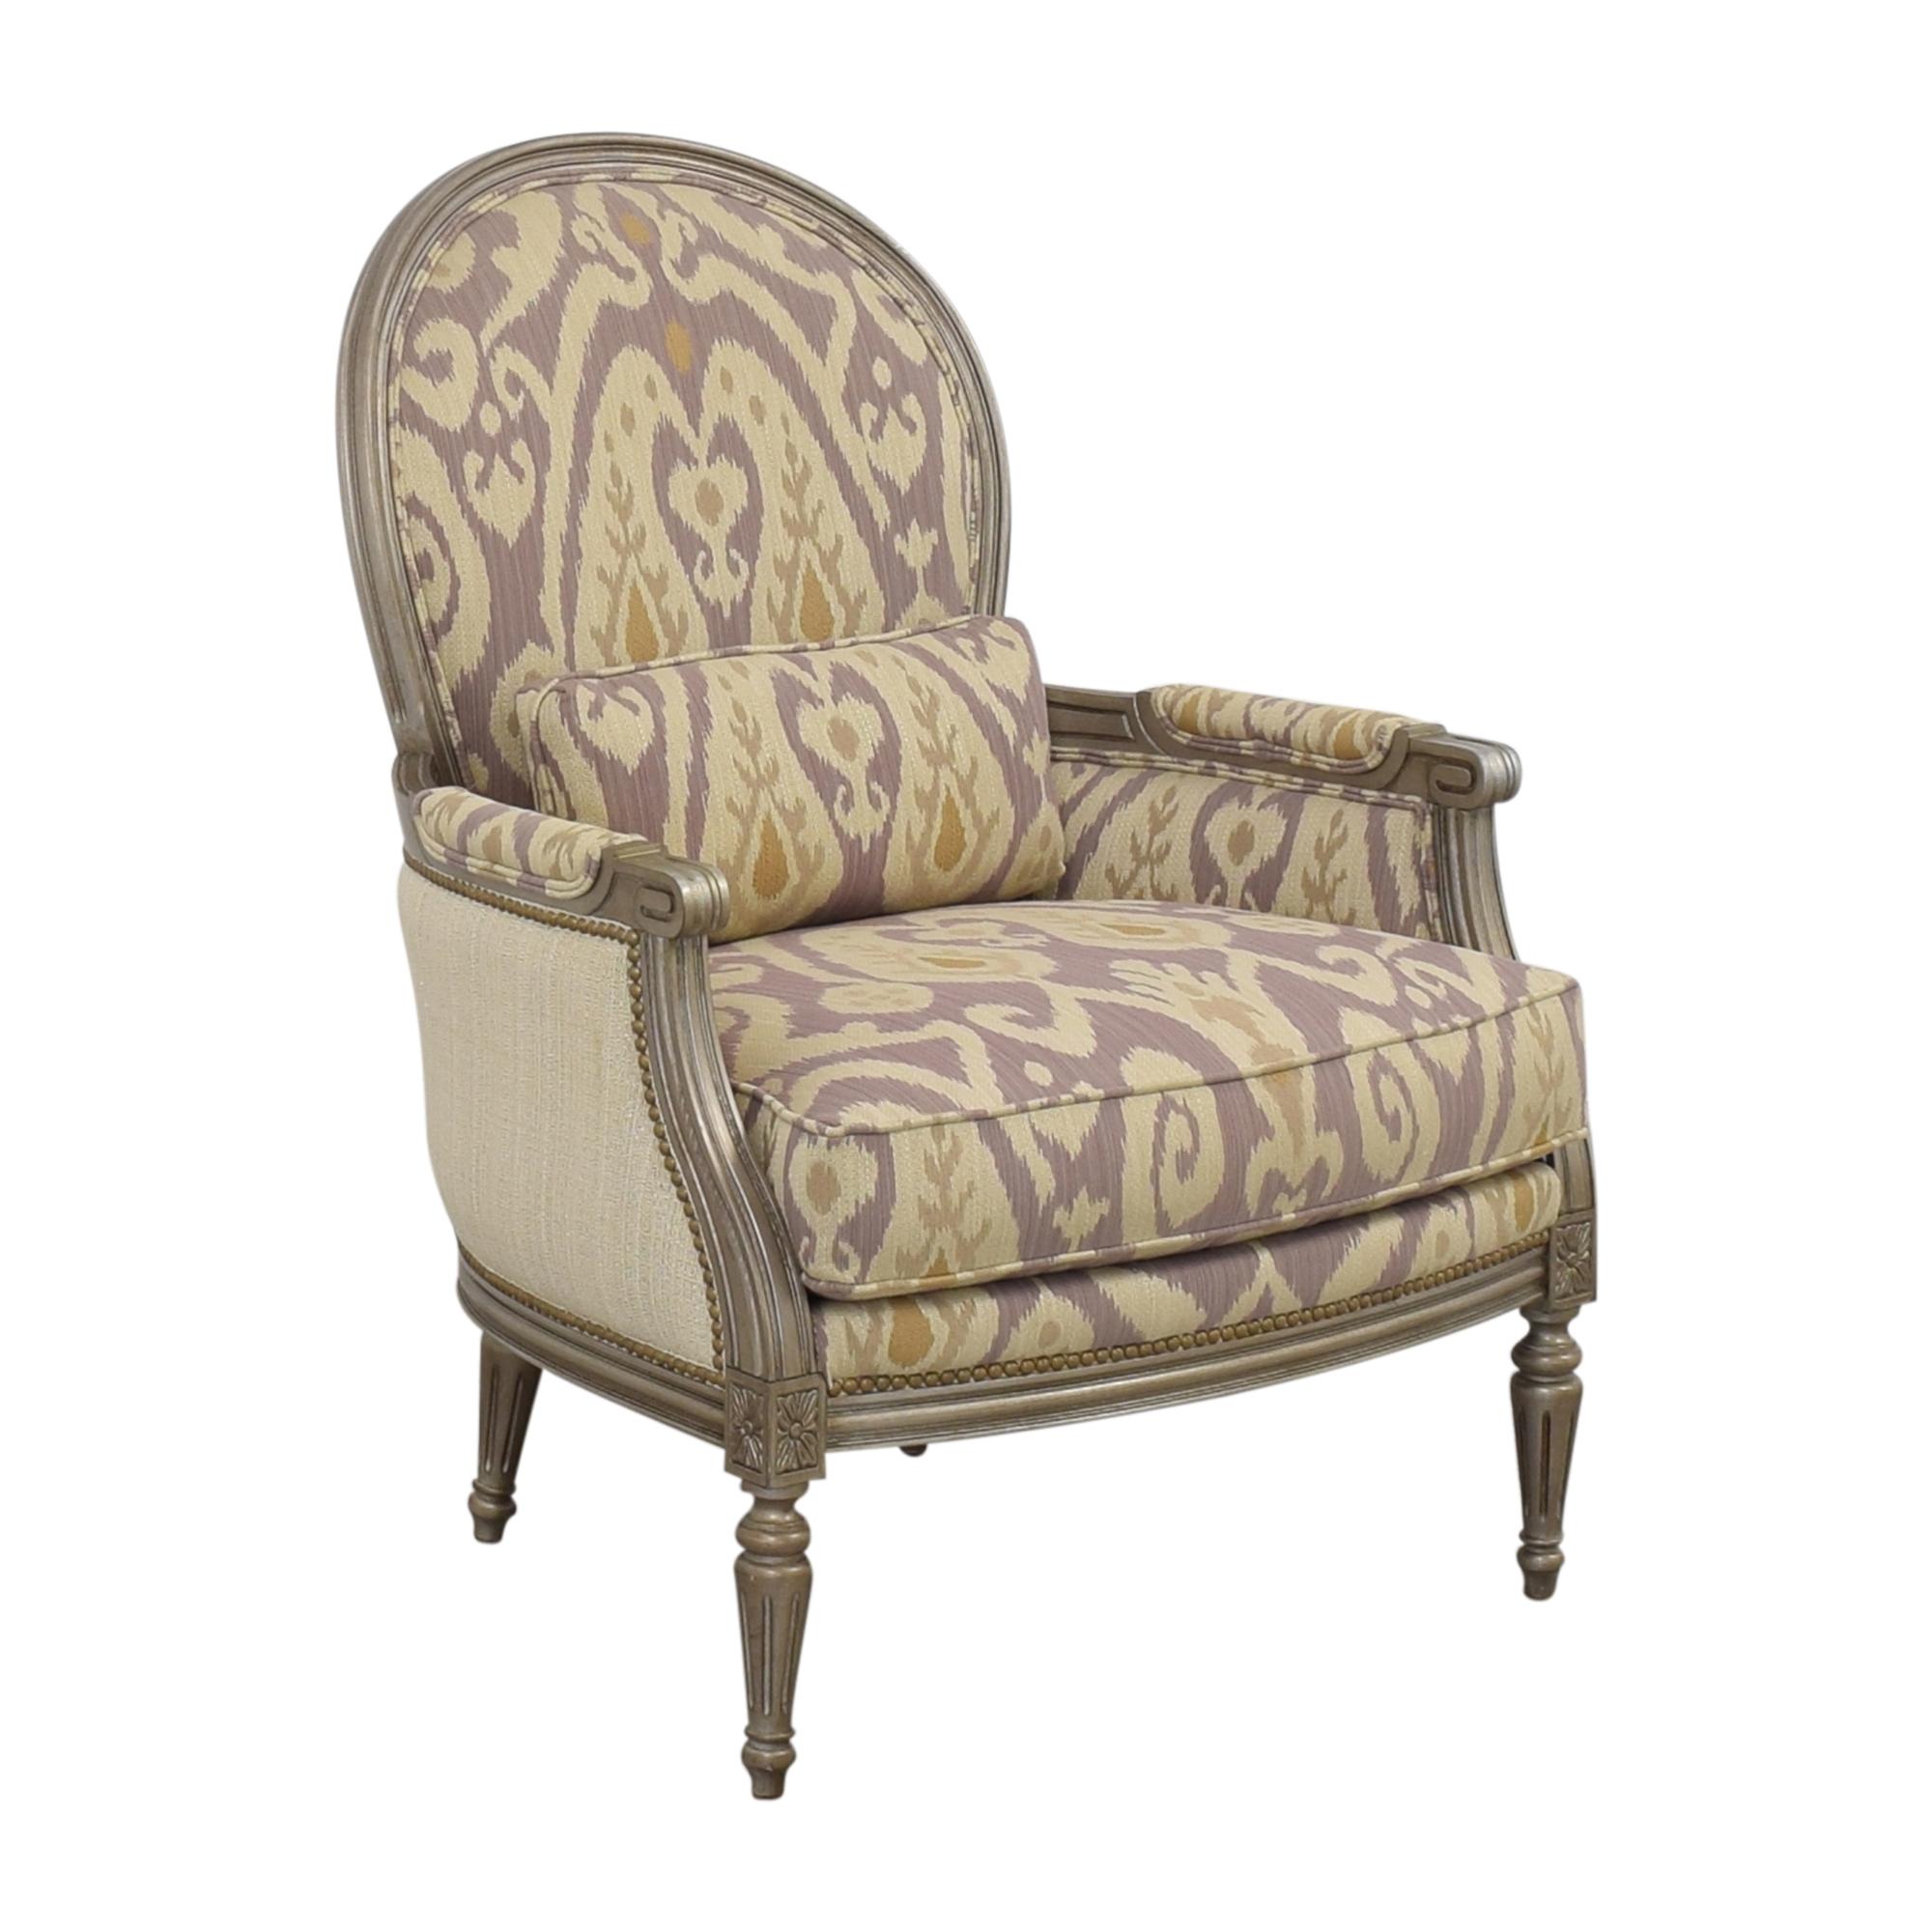 5% OFF - Ethan Allen Ethan Allen Suzette Chair / Chairs